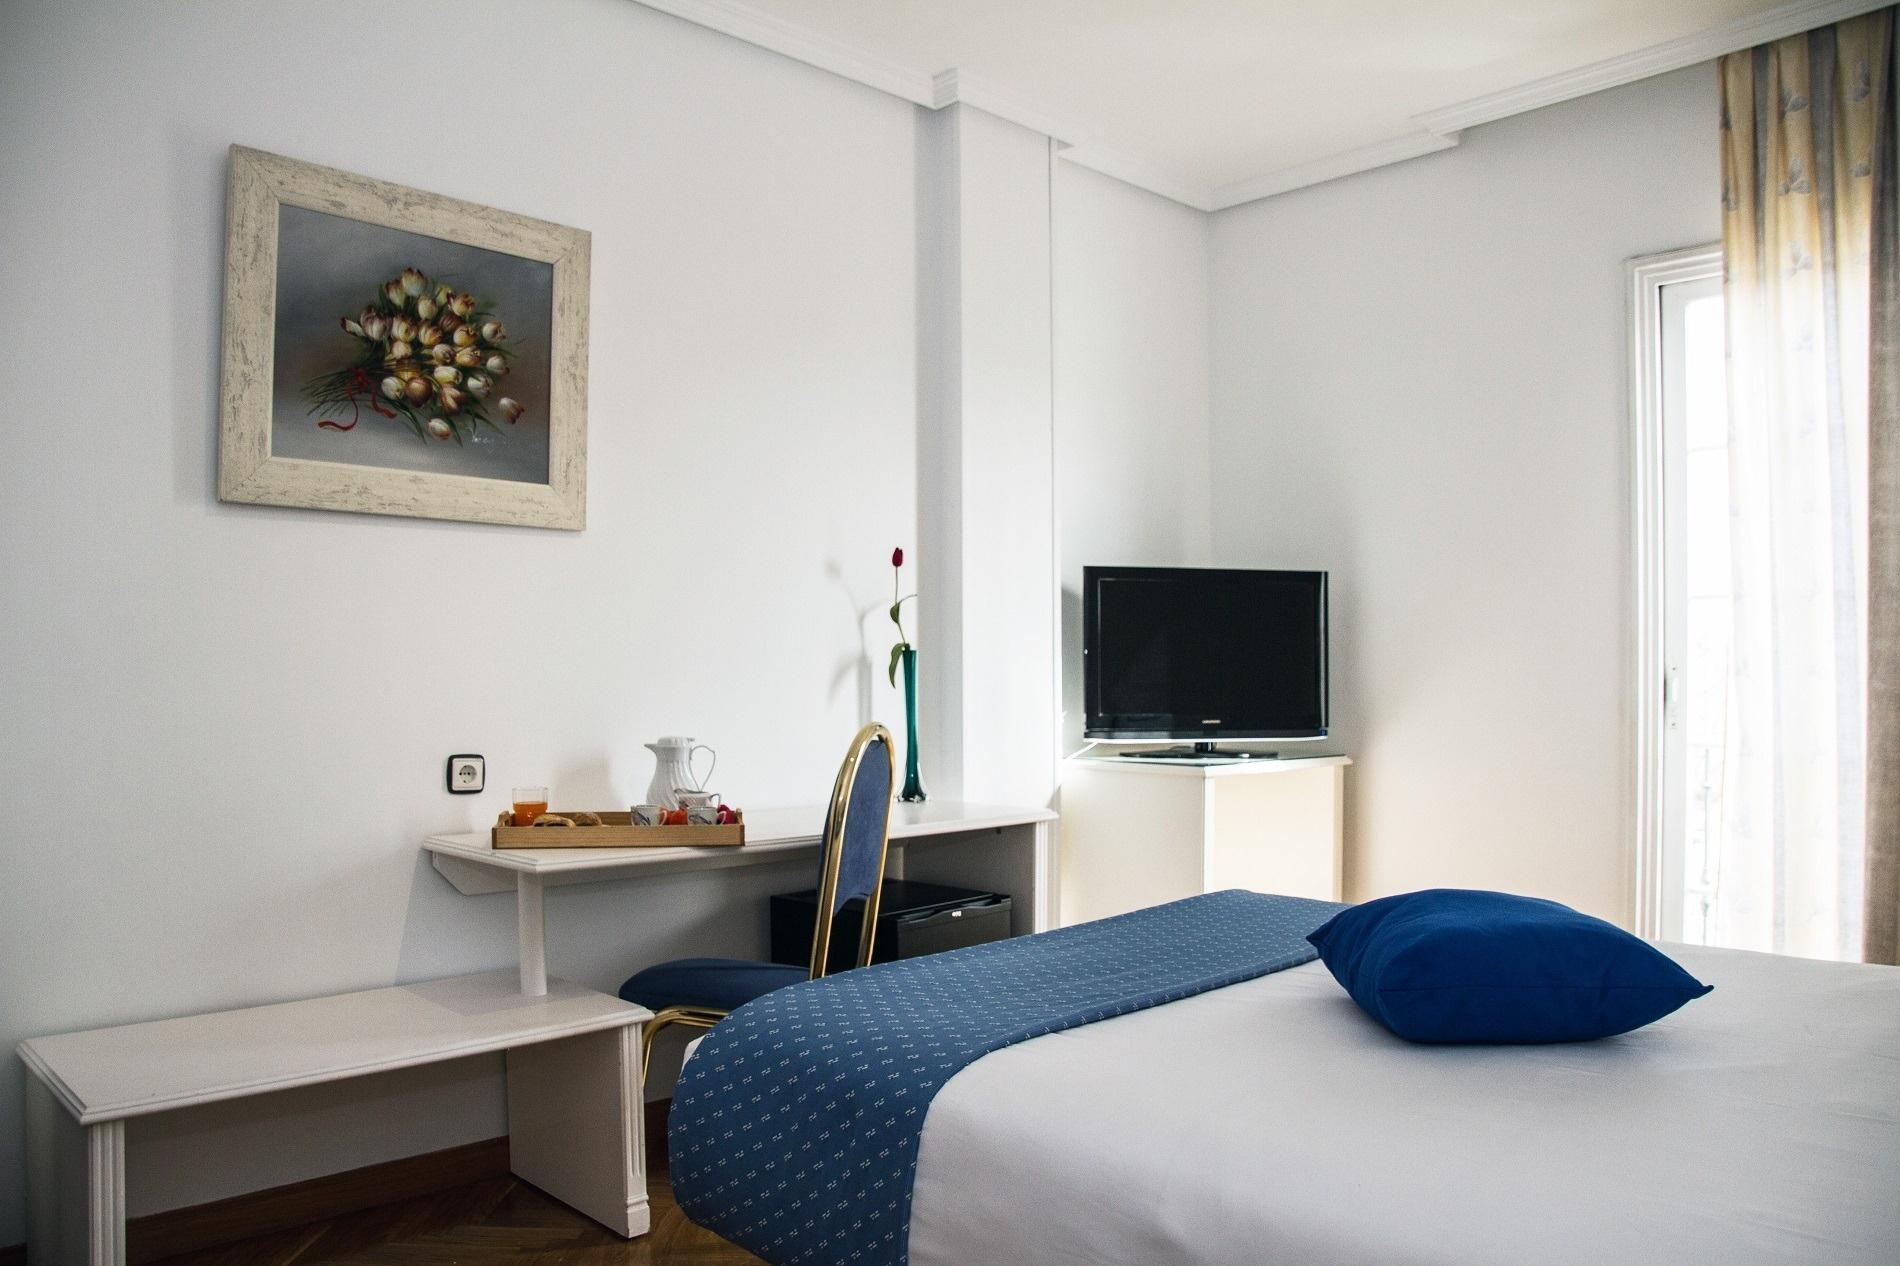 Hotel Checkin Madrid Parla **** | Madrid | Web Oficial